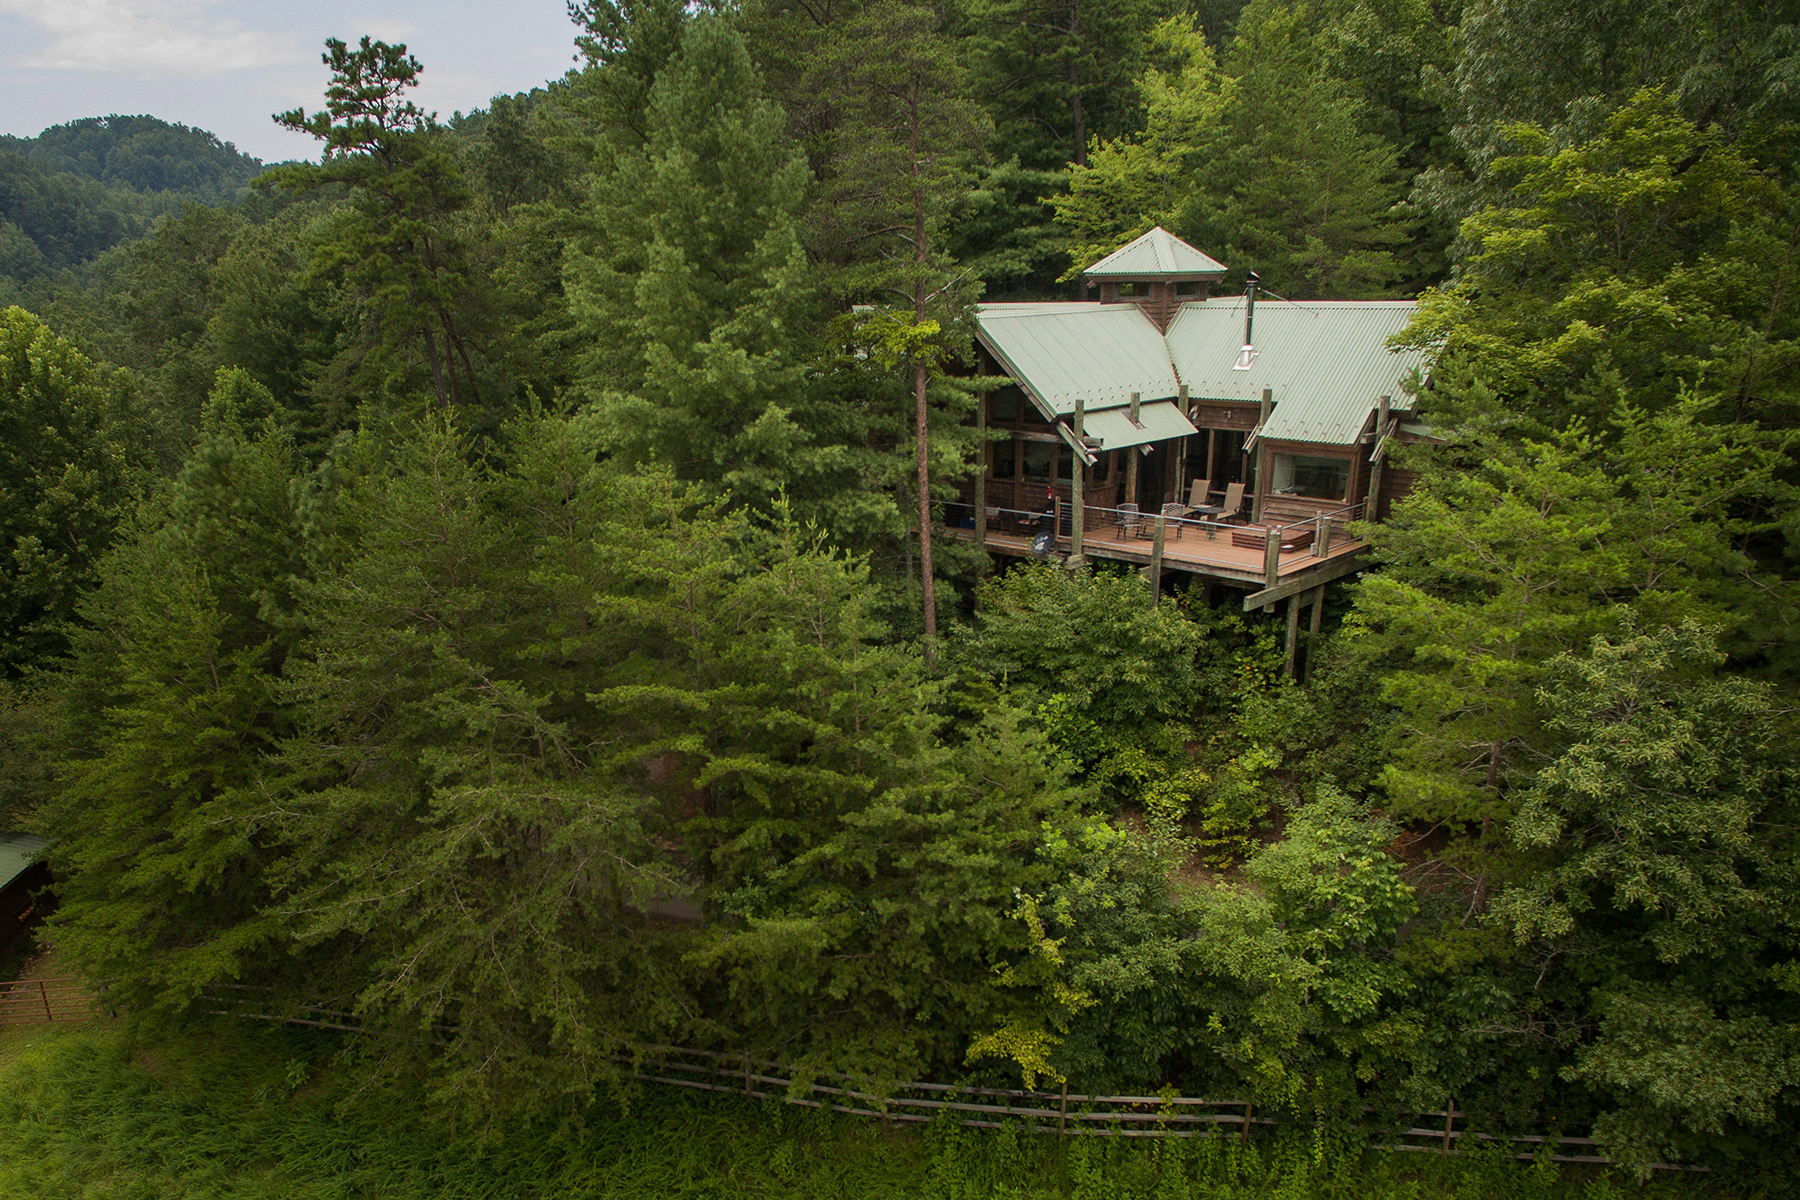 Single Family Homes for Sale at LEATHERWOOD MOUNTAIN - FERGUSON 992 Wild Turkey Rd Ferguson, North Carolina 28624 United States